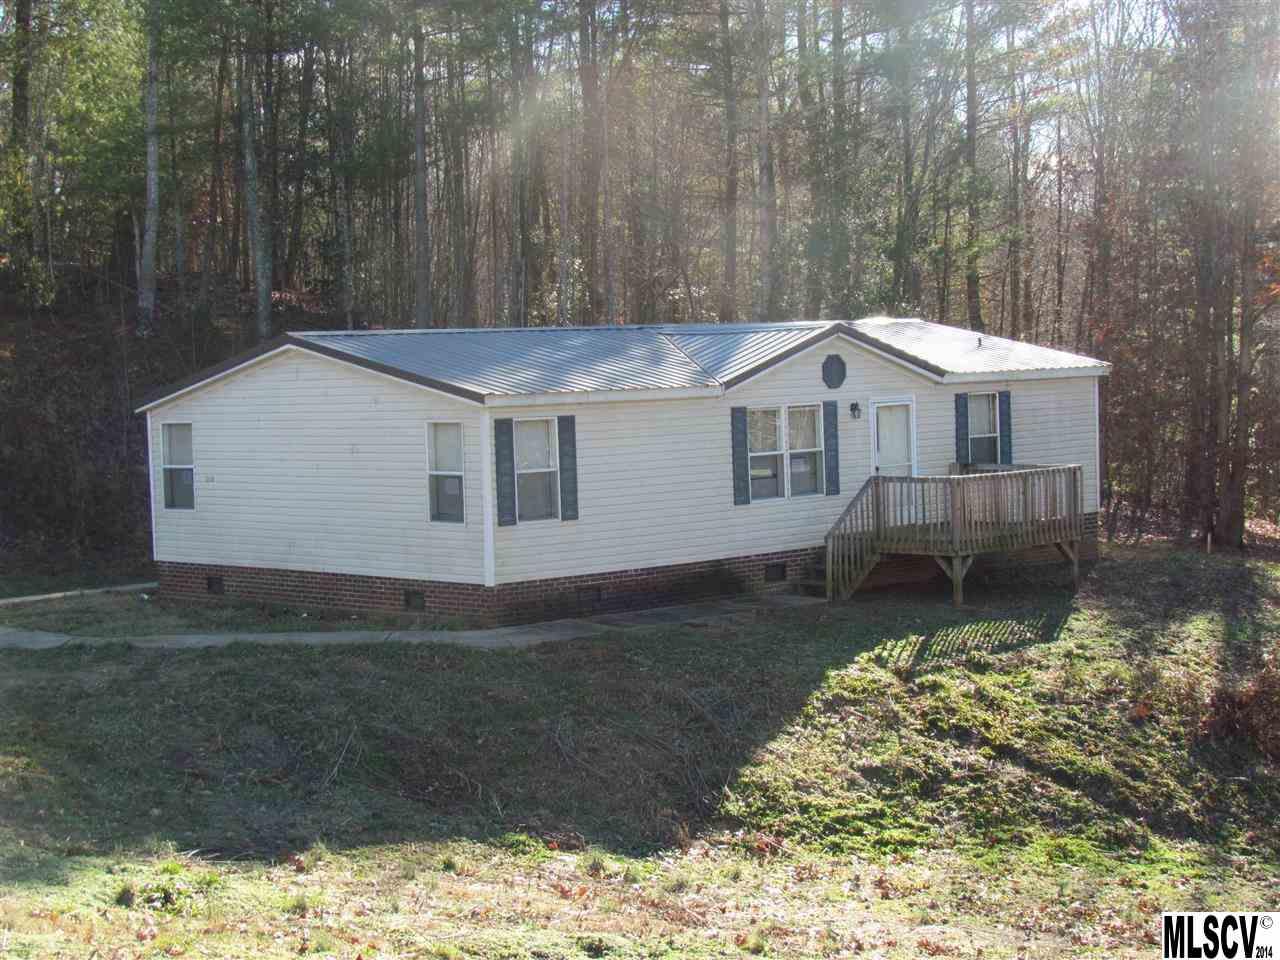 Real Estate for Sale, ListingId: 27748046, Lenoir,NC28645